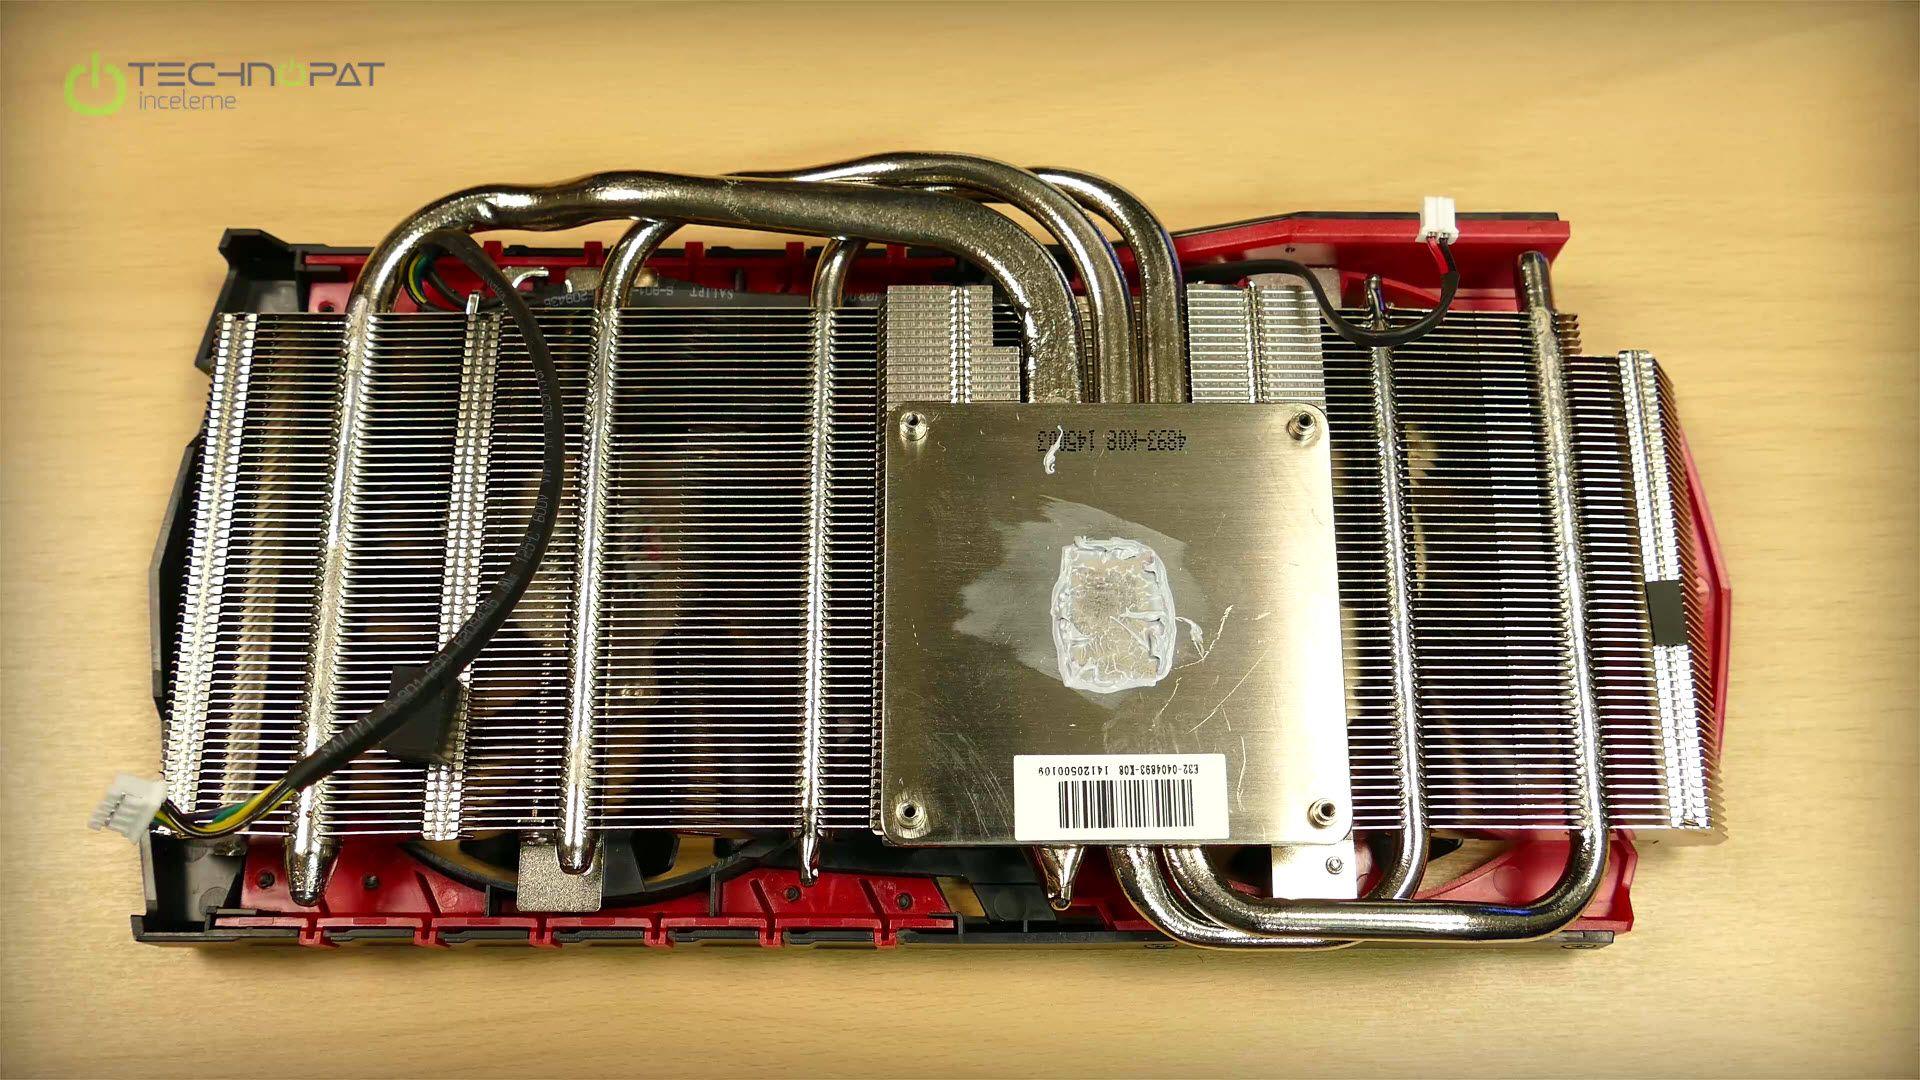 MSI GTX 960 Gaming 2G İncelemesi: Twin Frozr 5 soğutma sistemi